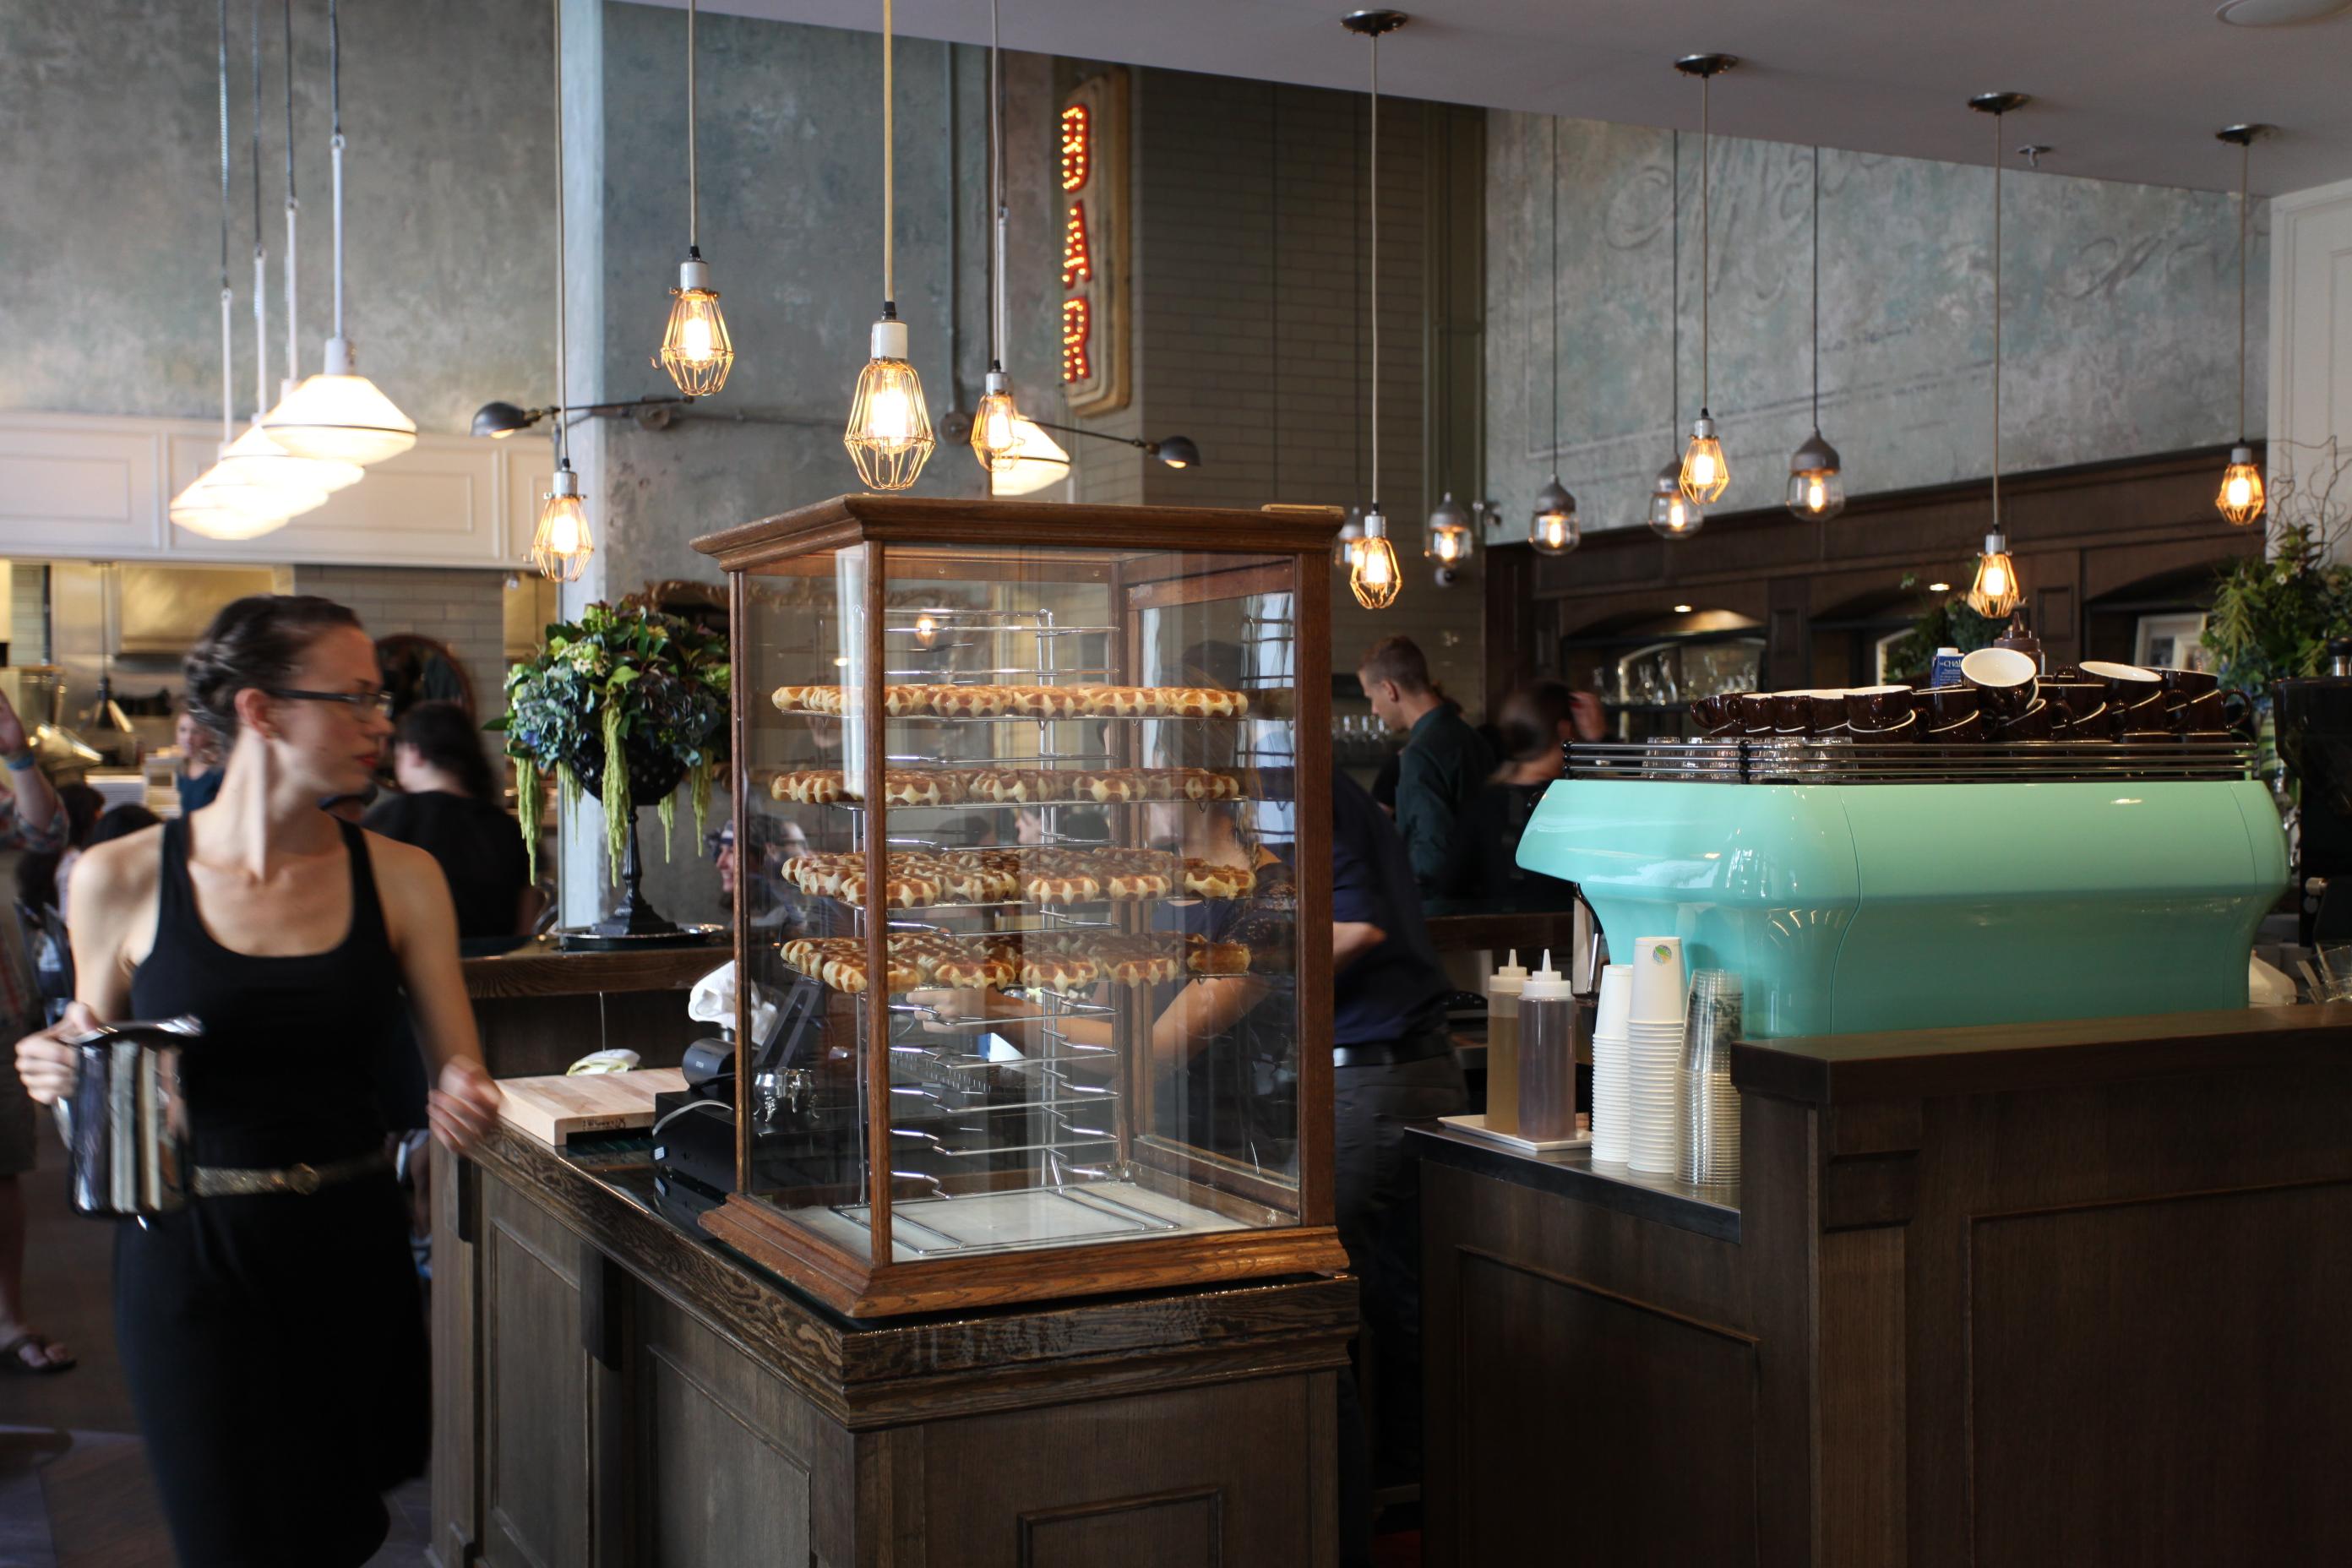 Cafemedina interior1 creditscoutmagazine